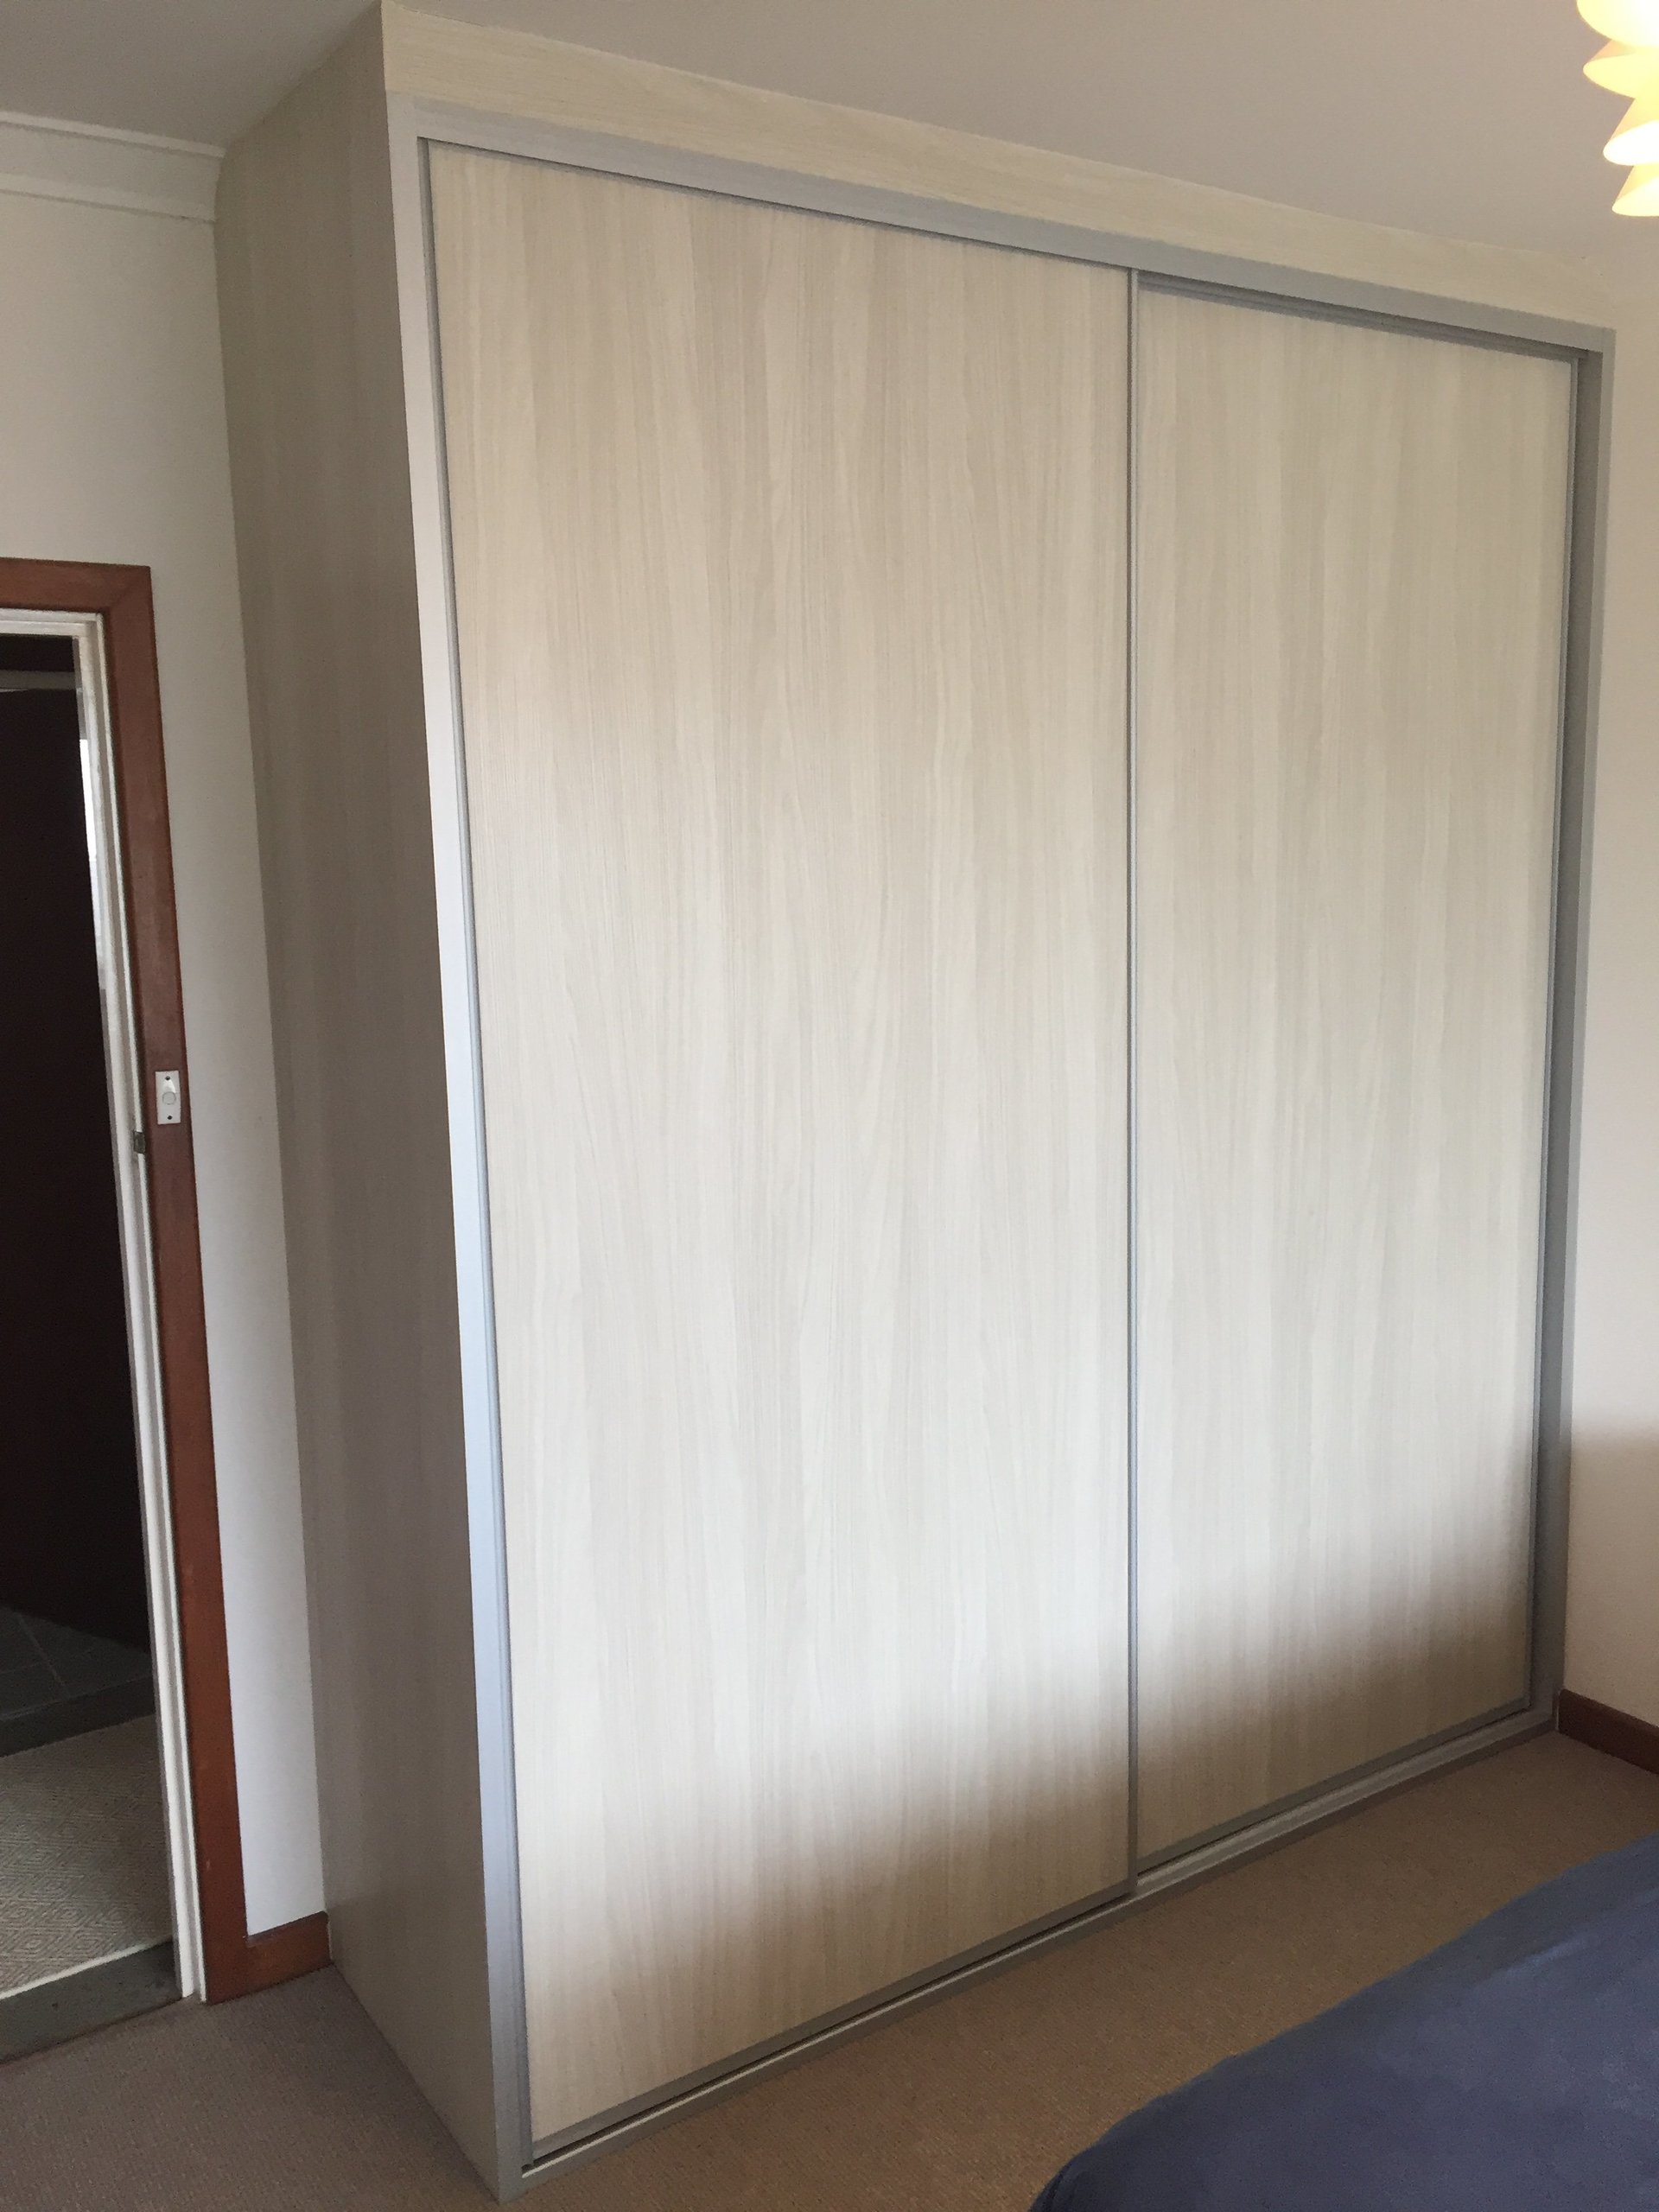 uzit in wa wardrobes gallery built closets perth walk closet